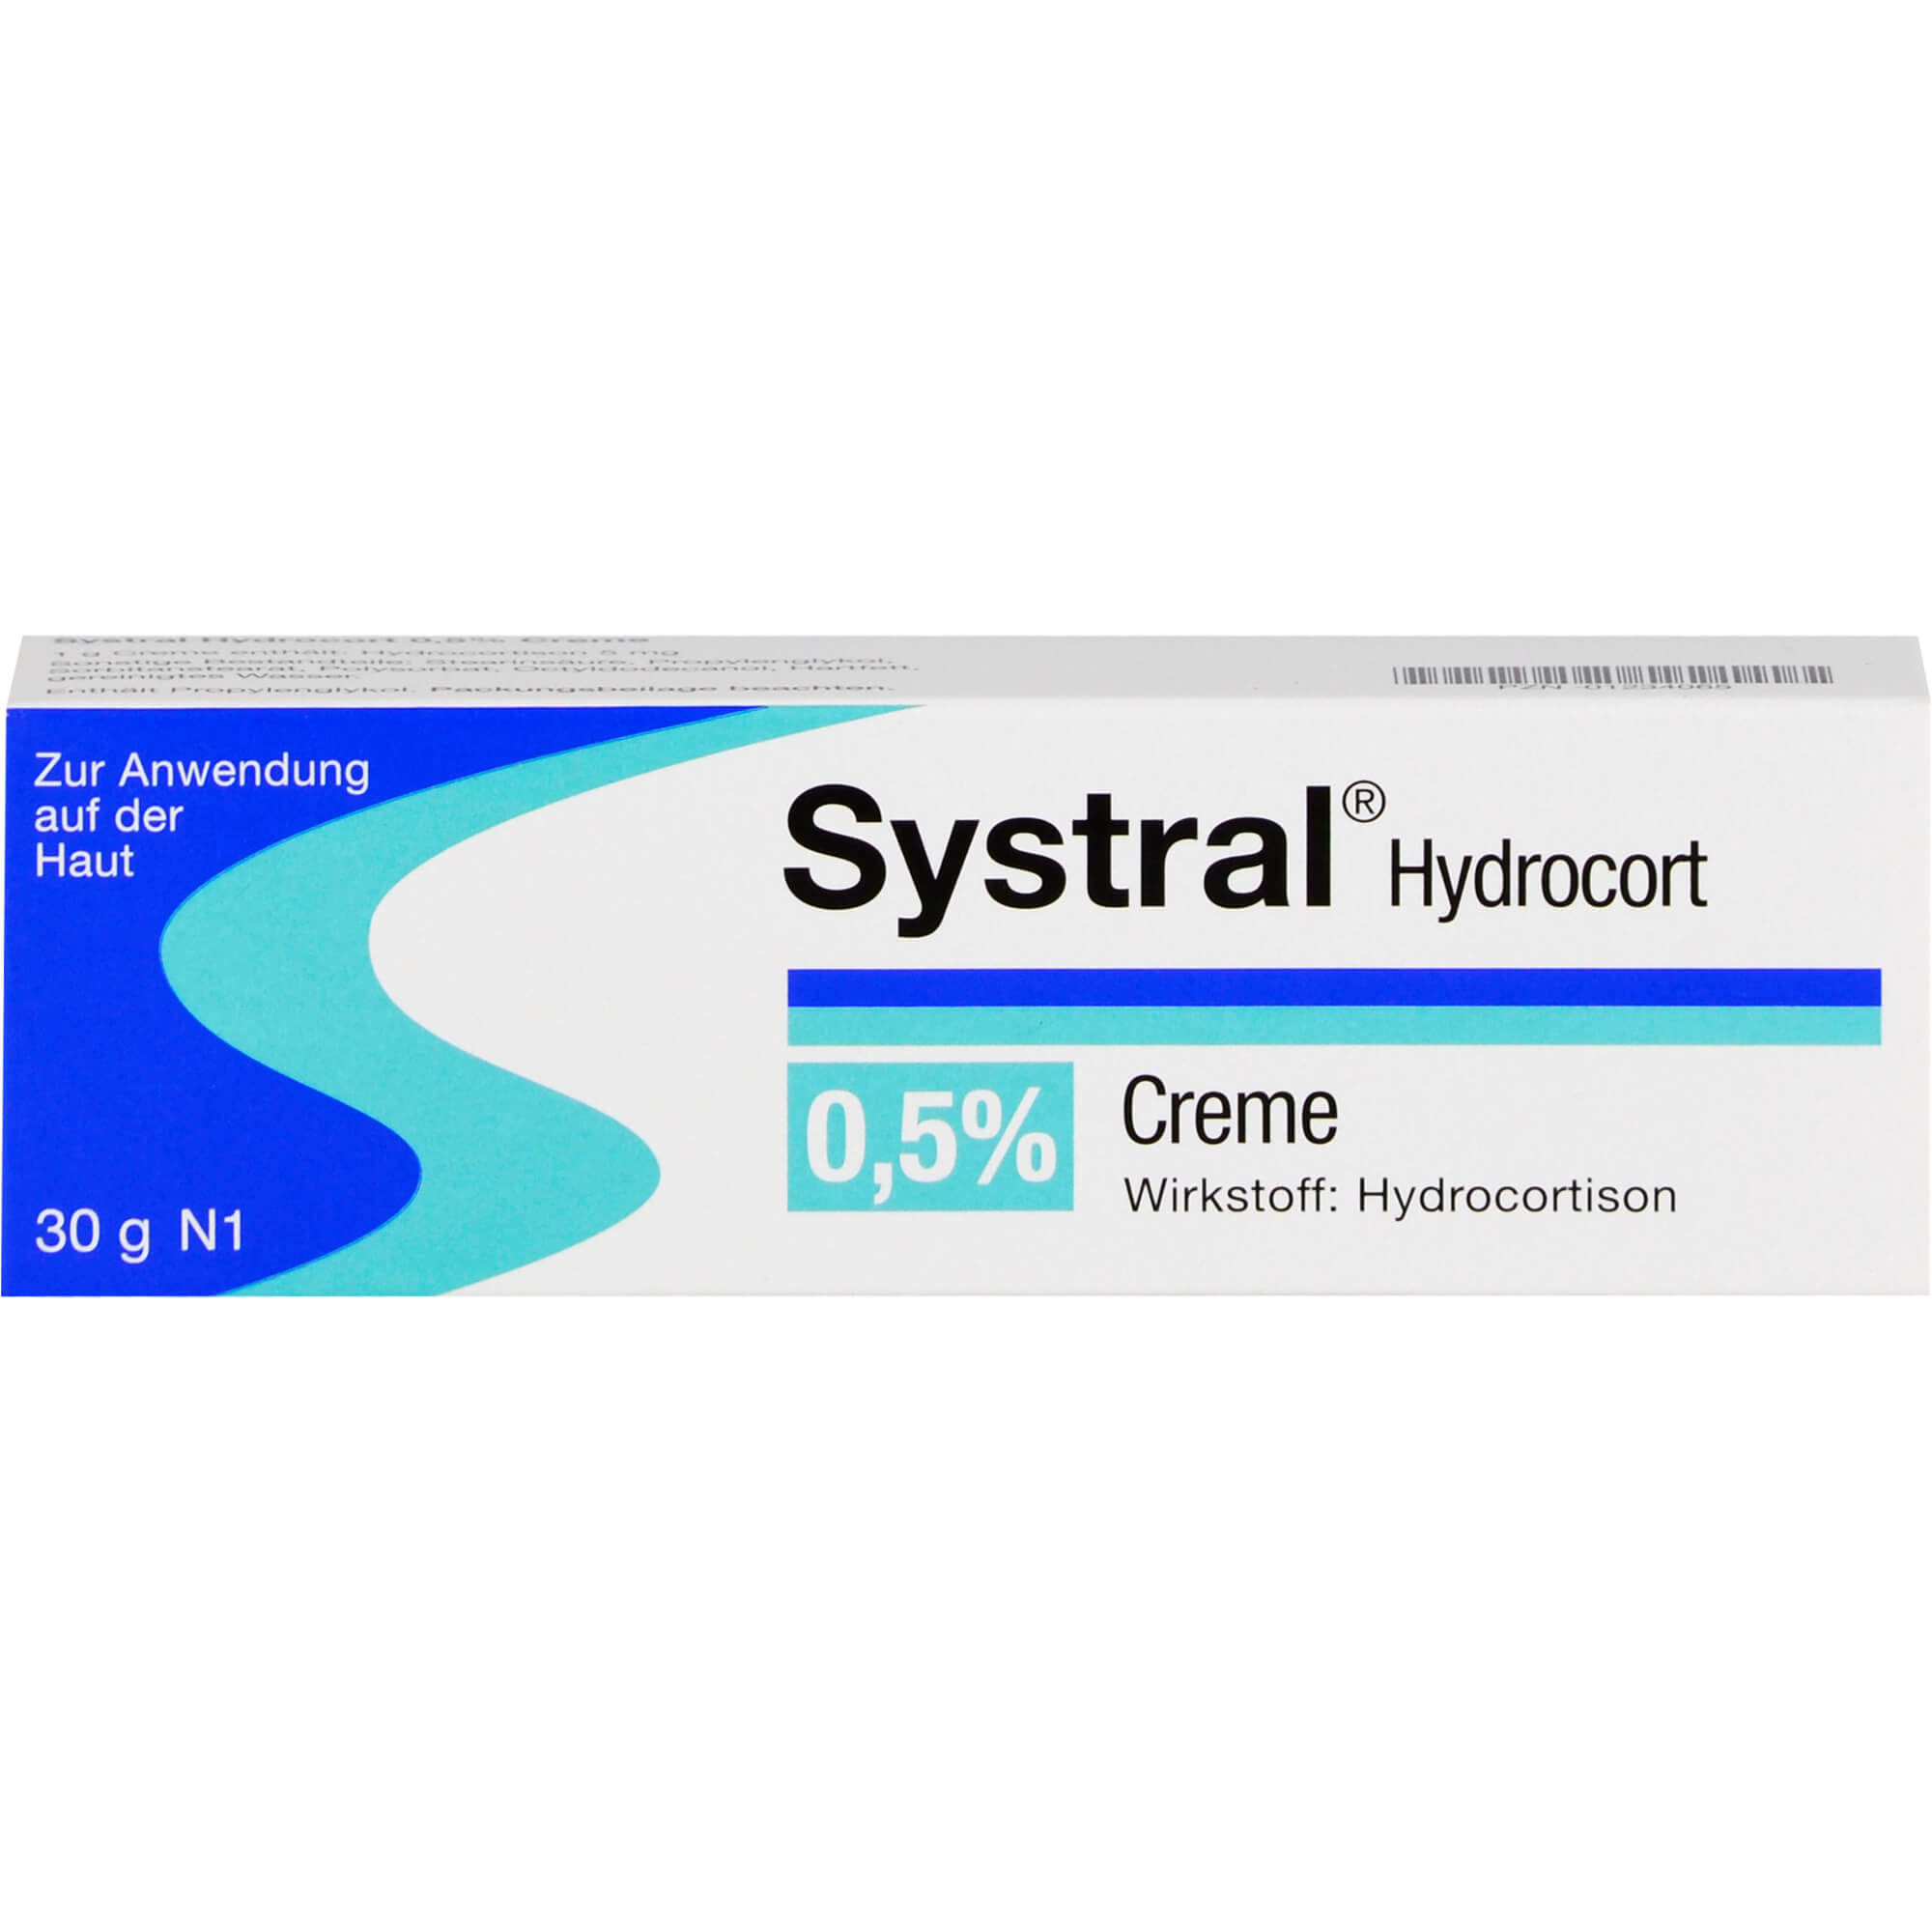 SYSTRAL Hydrocort 0,5% Creme